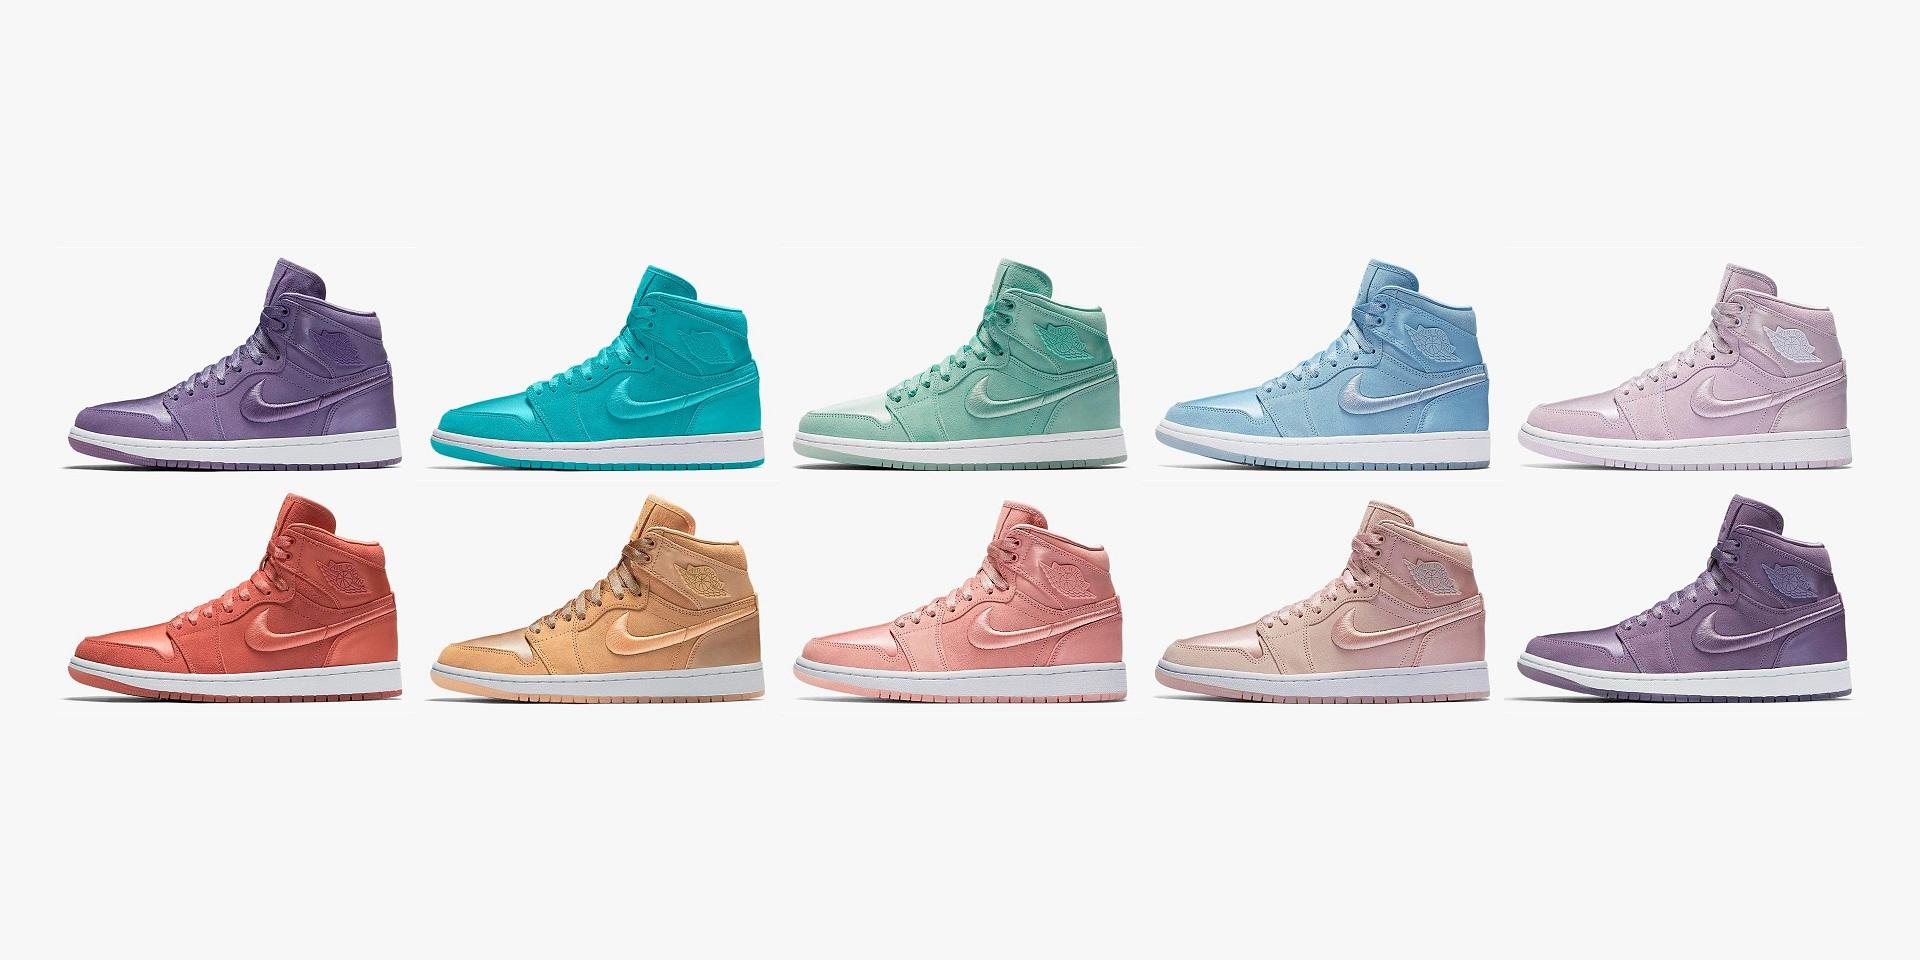 d170931bd6ea42 Air Jordan 31 Tar Heels Walking Shoe